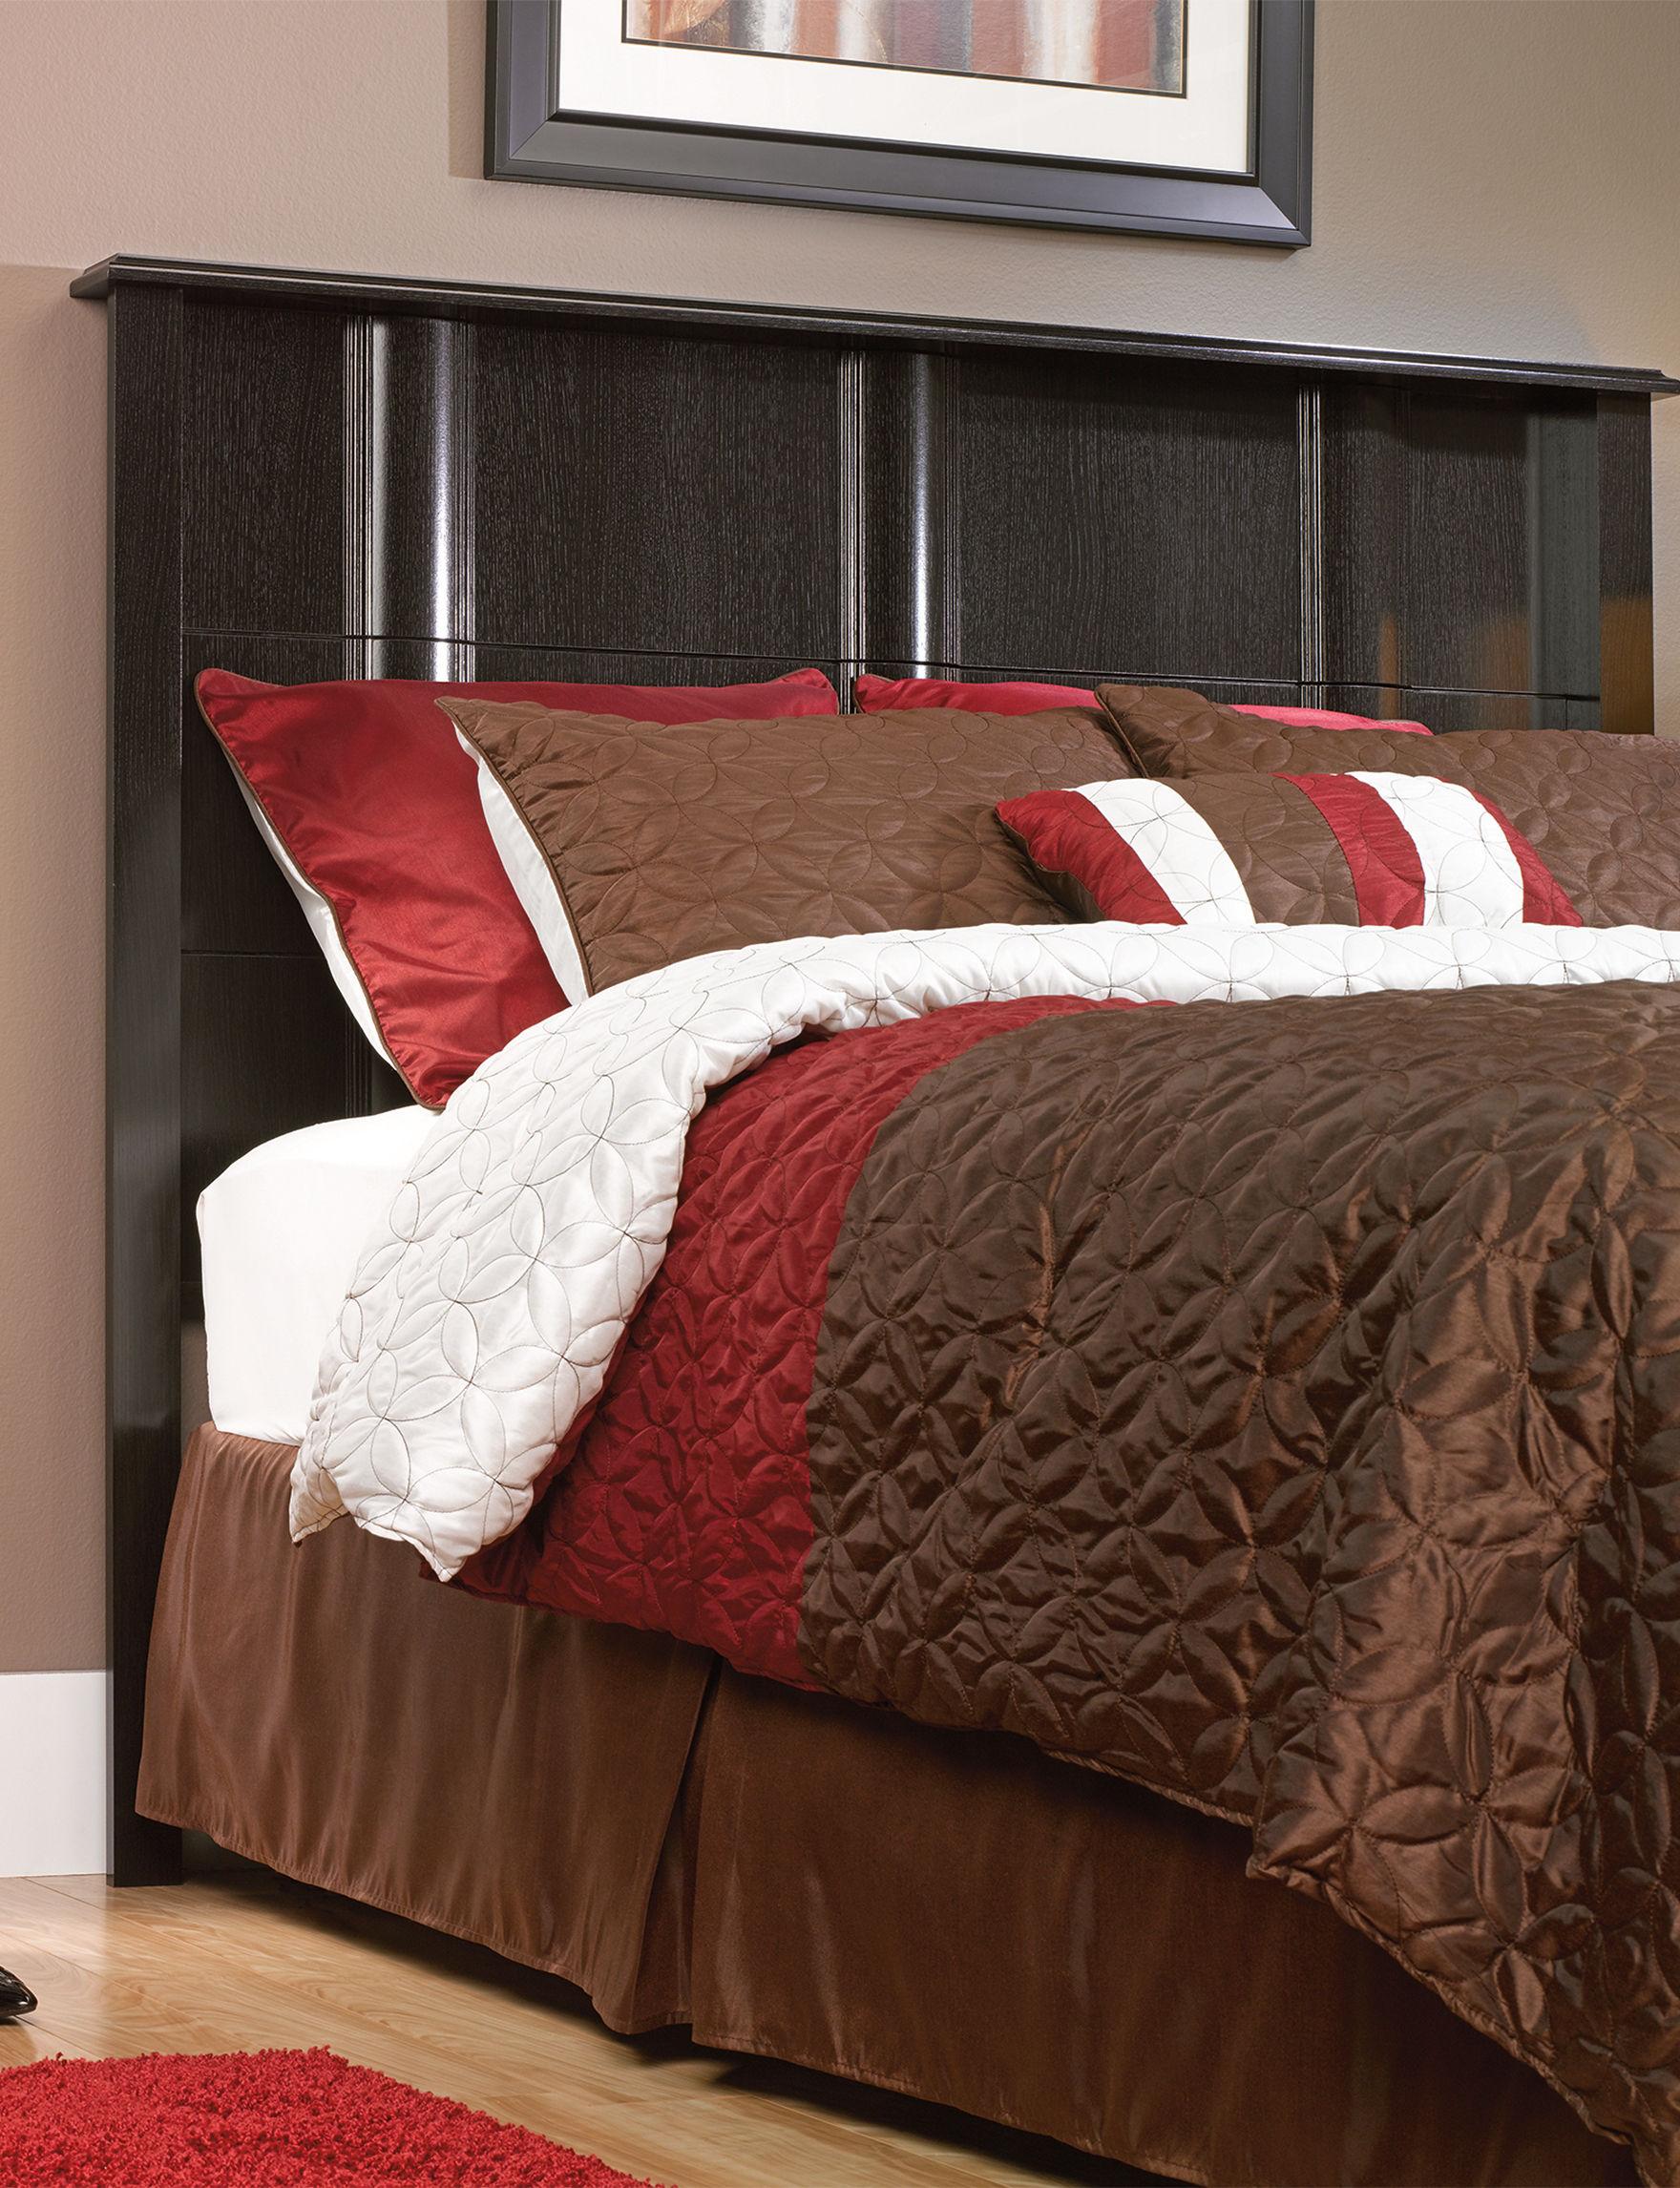 Sauder Espresso Beds & Headboards Bedroom Furniture